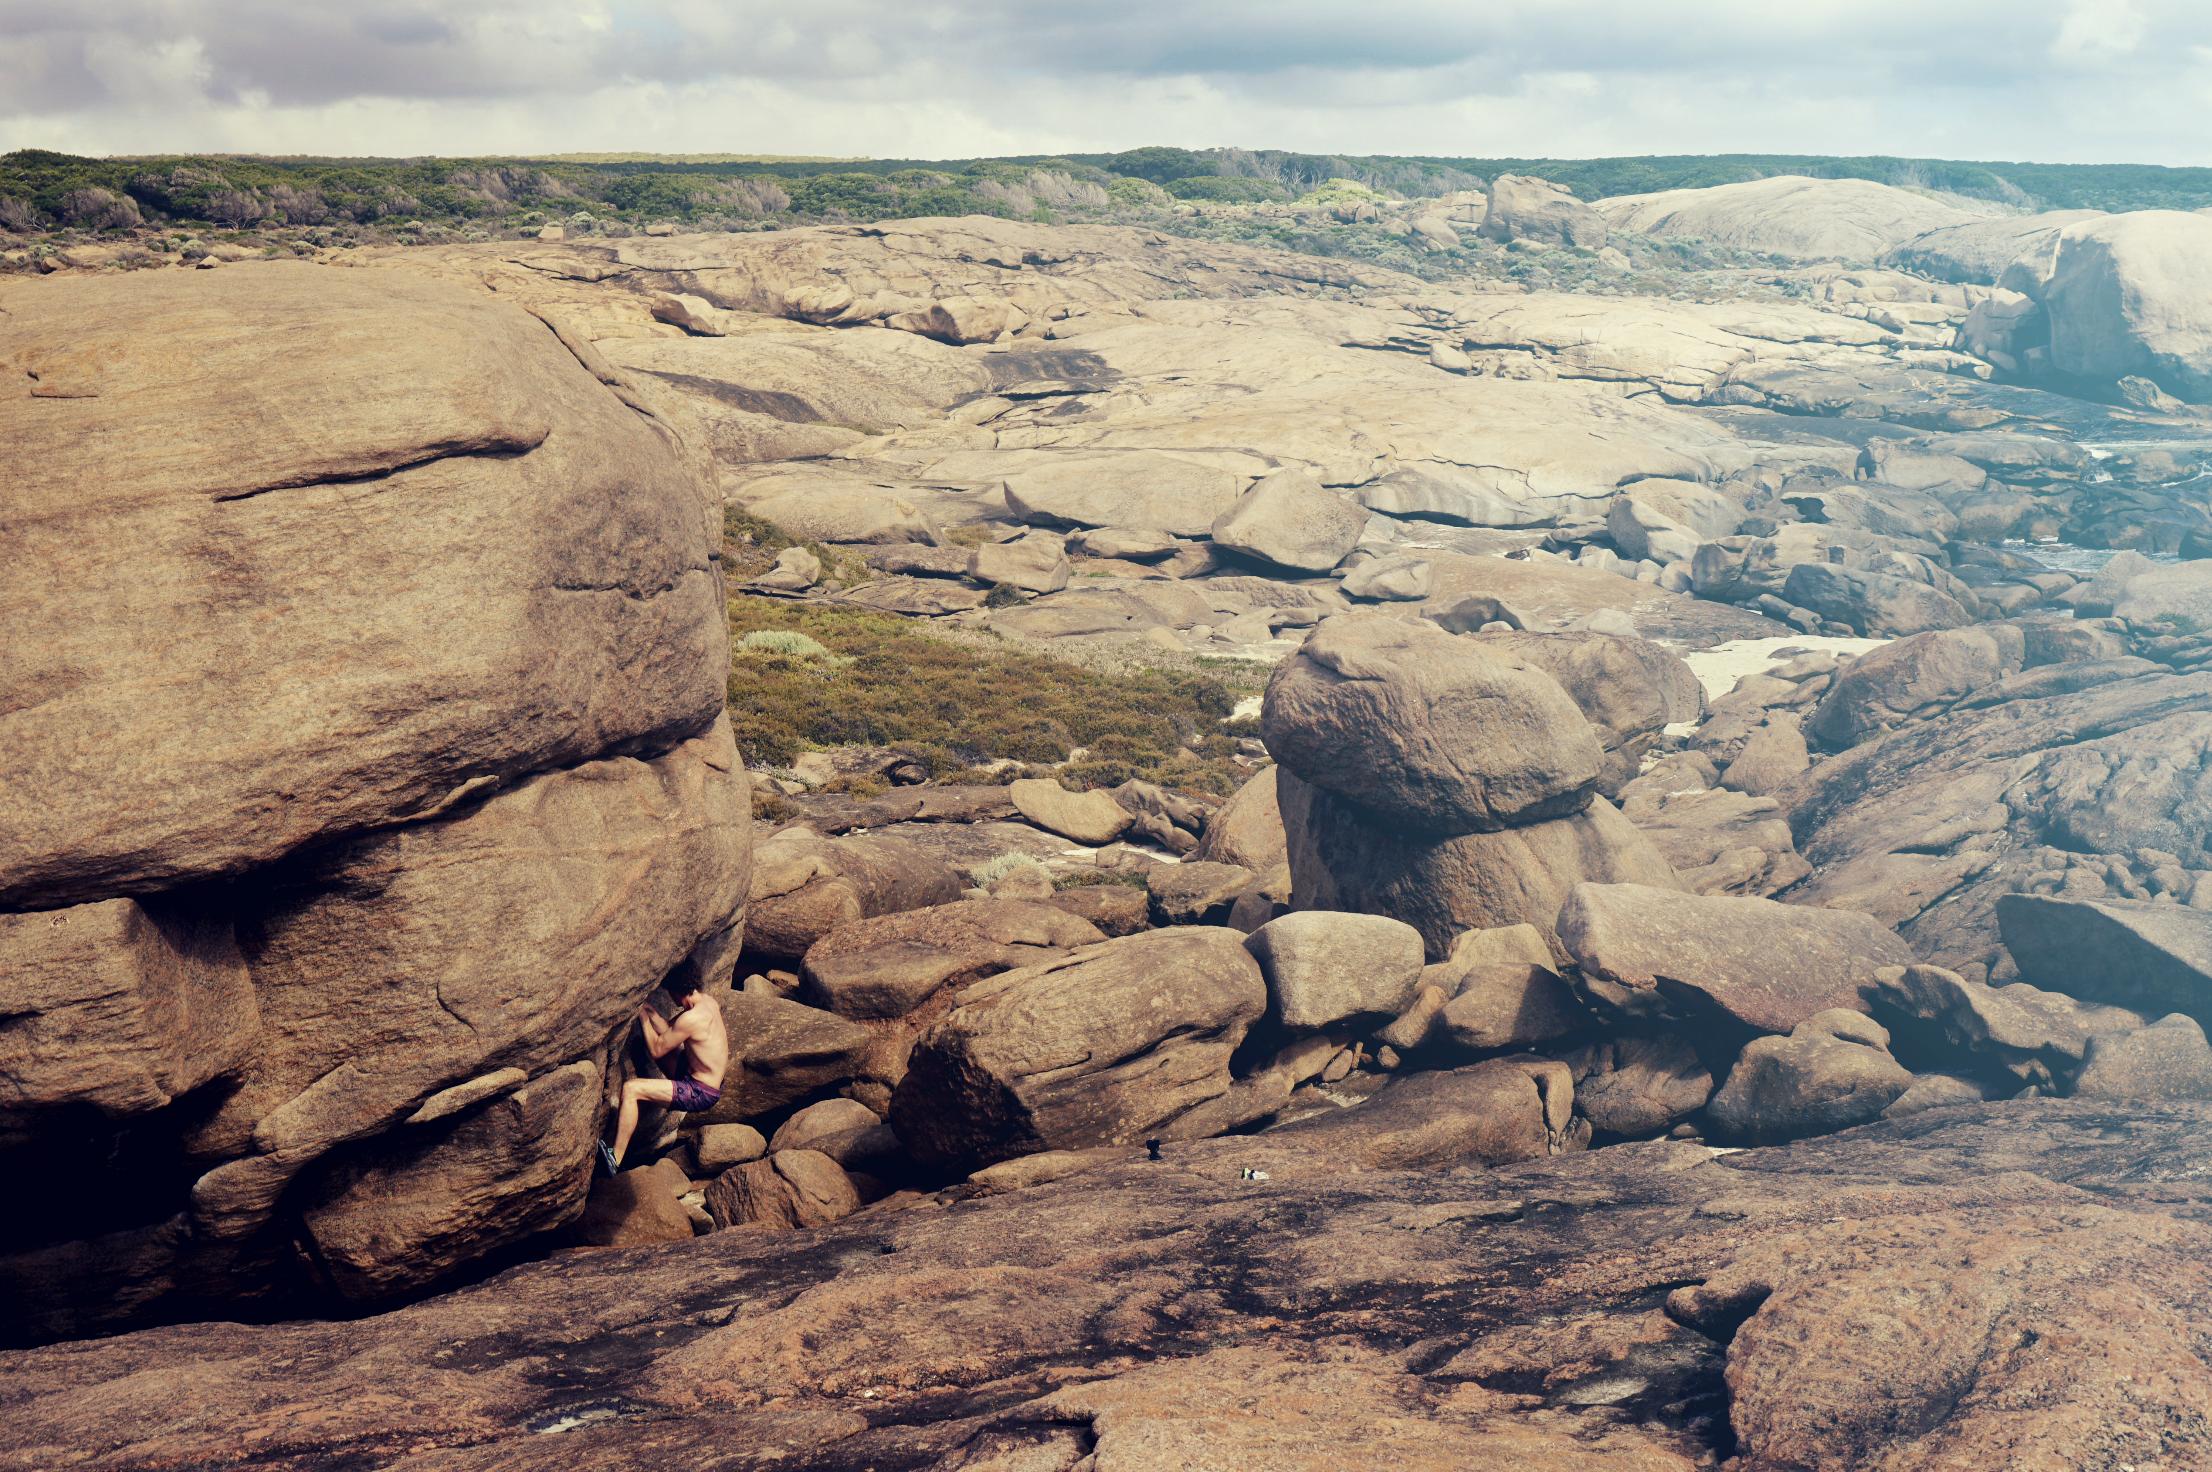 maybeyoulike_bouldering_australia_20